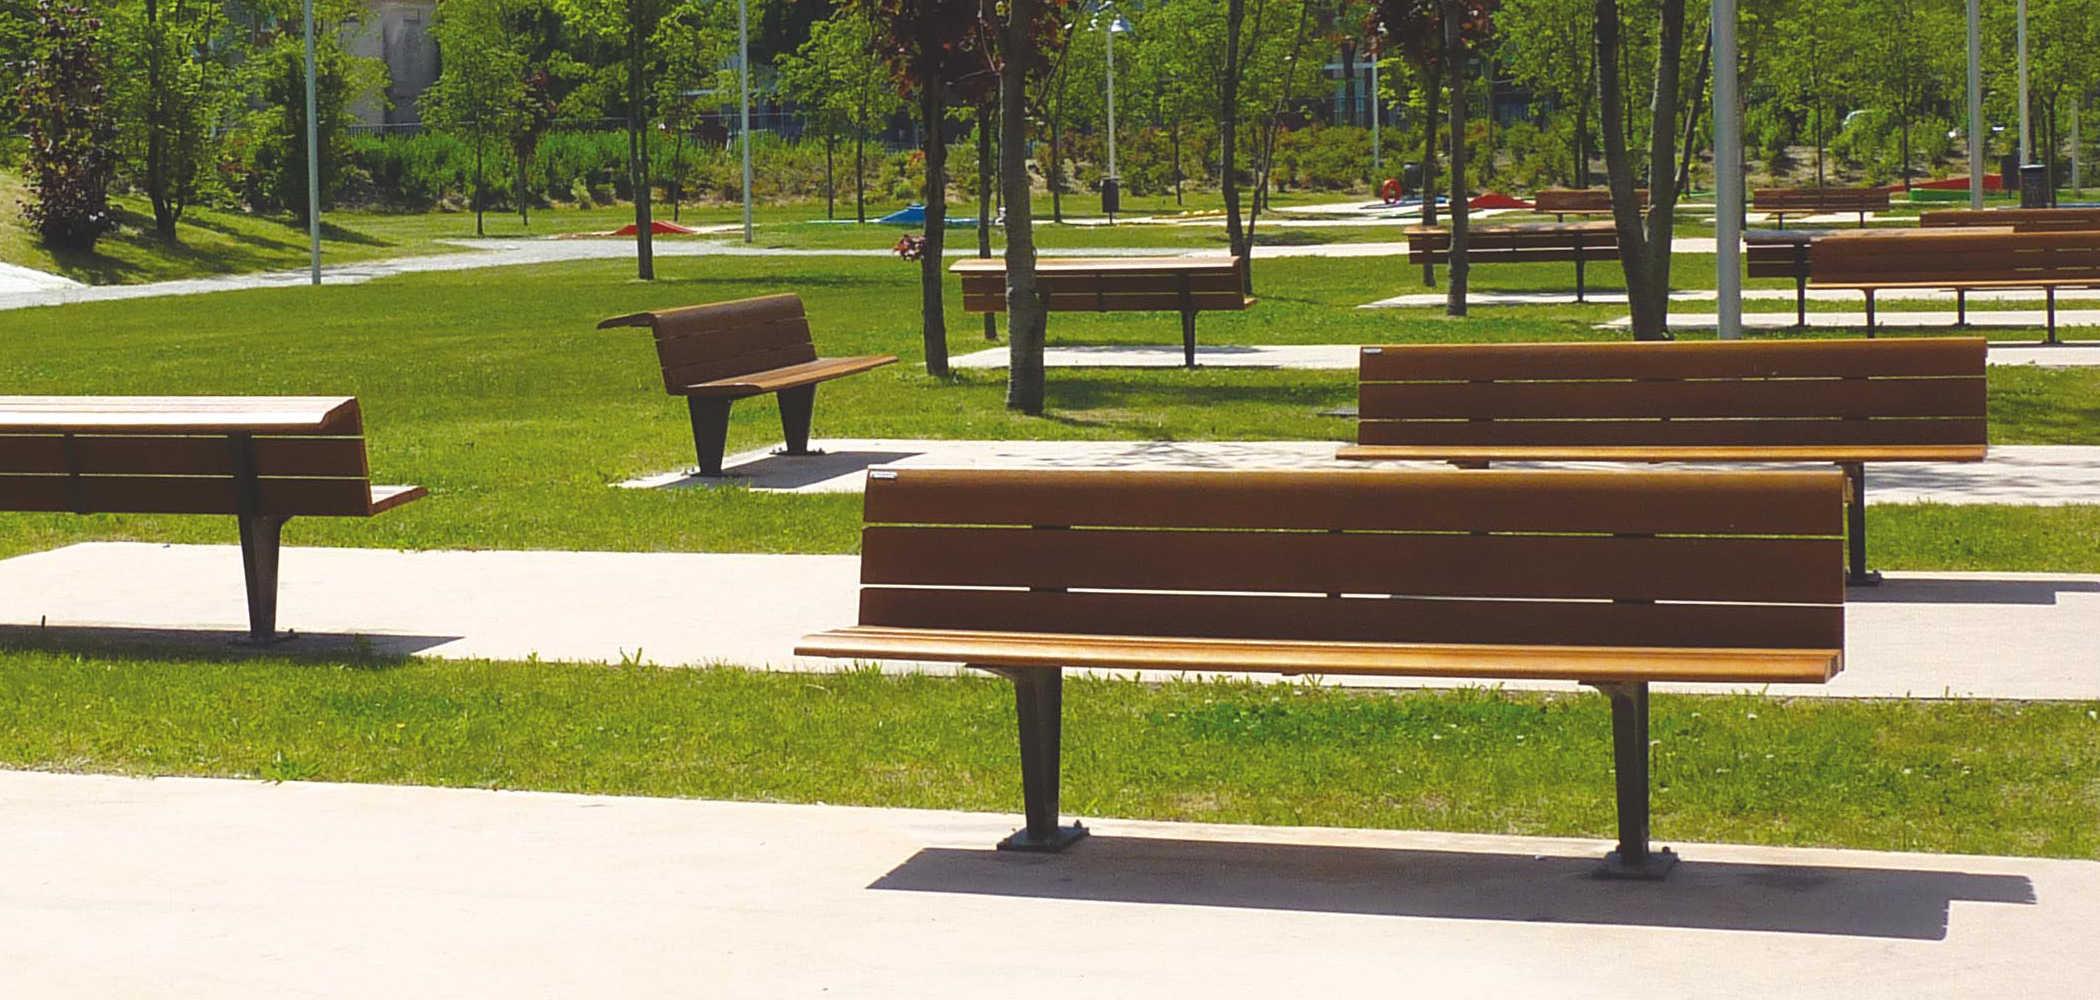 Panchine giardini pubblici sedis sedis torsion metalco for Arredo urbano panchine